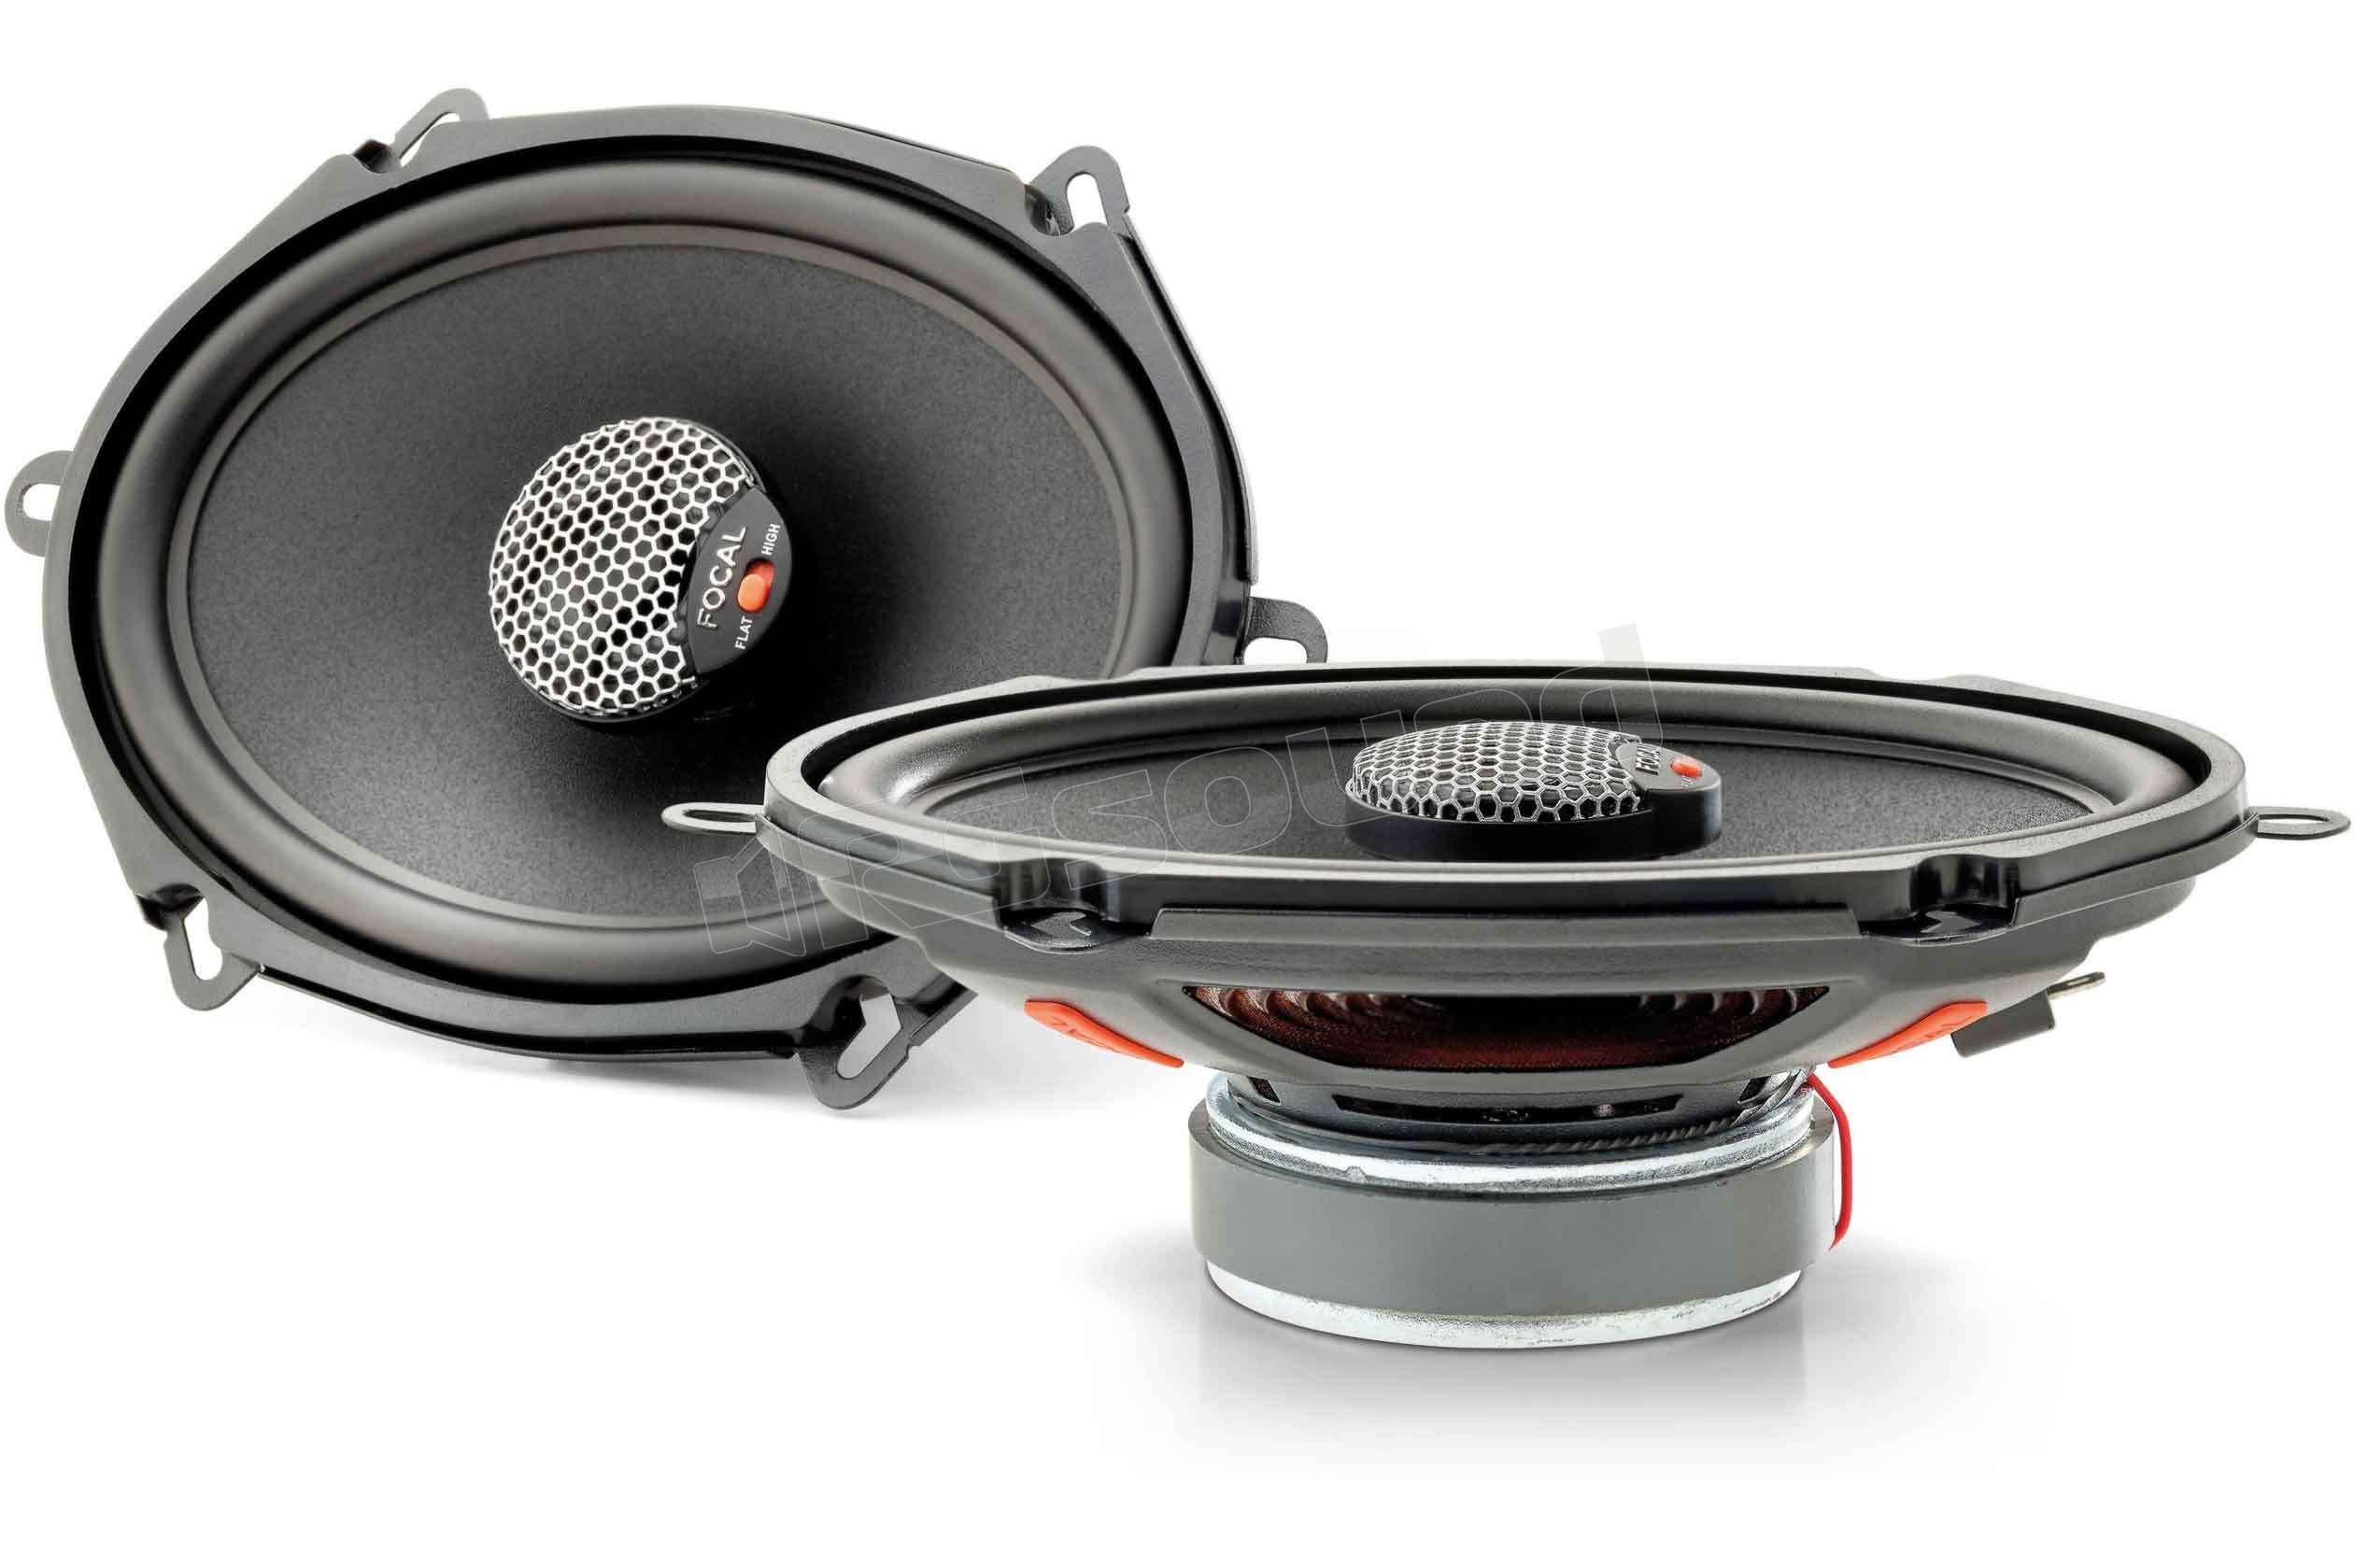 Focal icu 570 coassiali coassiali ellittici 5x7 :: rg sound store ::